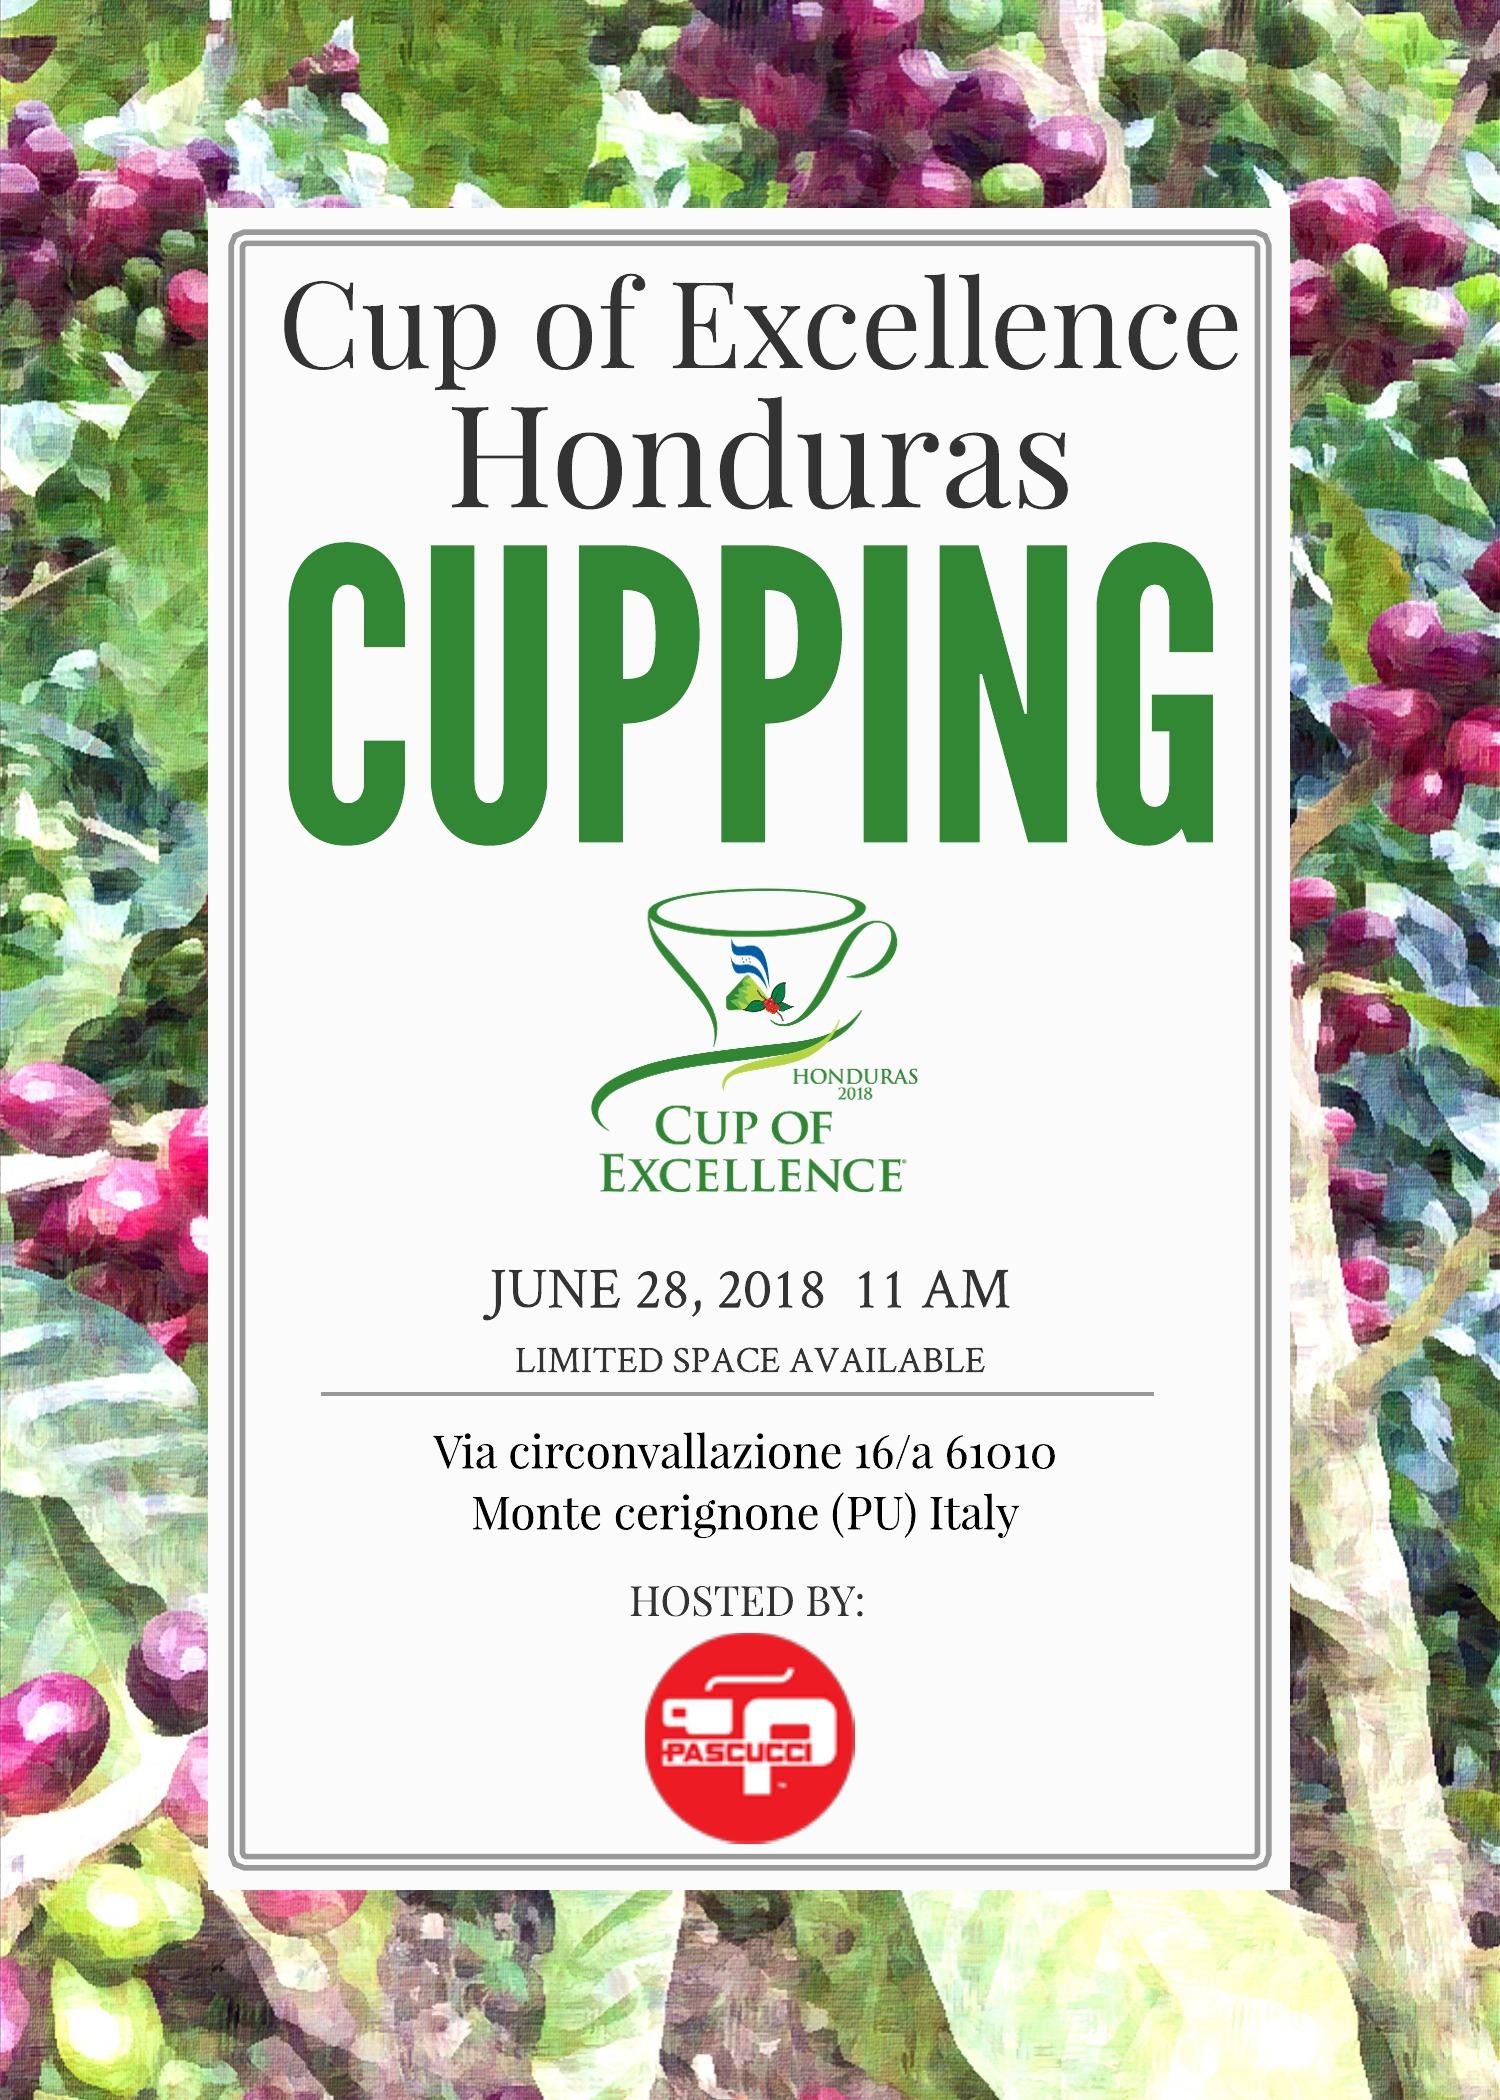 Caffè Pascucci Cup Of Excellence coffee Honduras